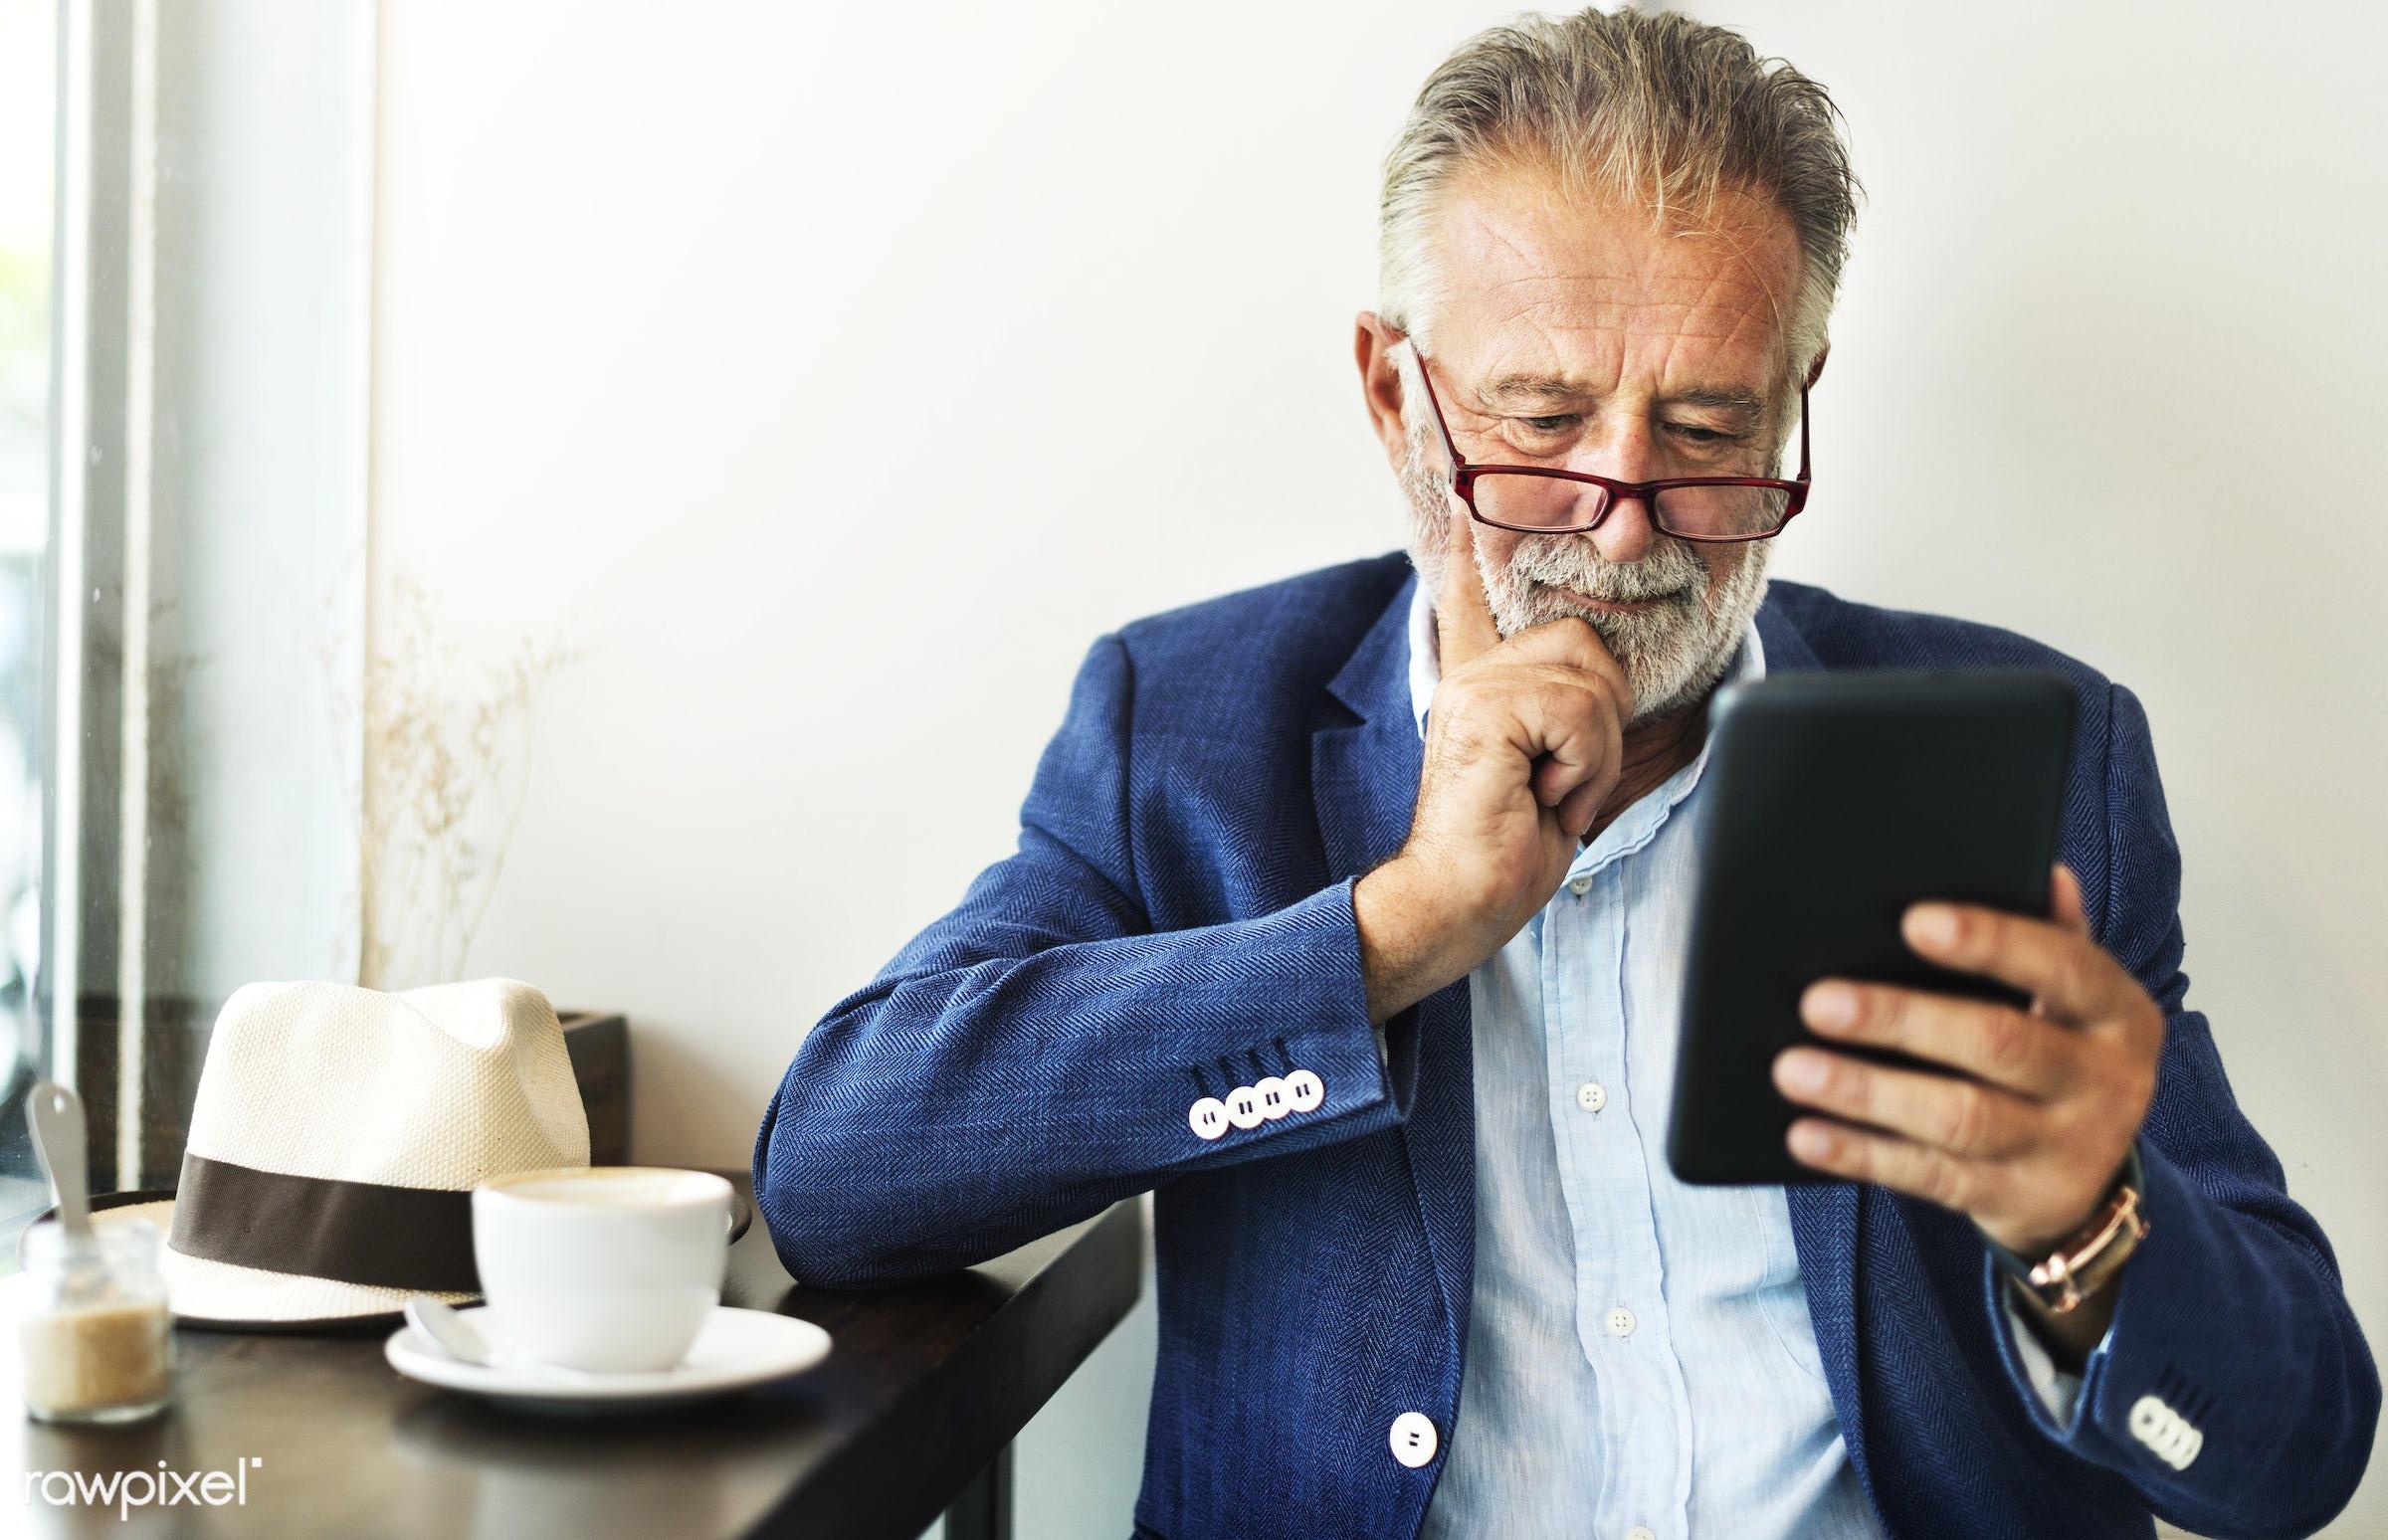 Elderly man is using digital tablet - elderly, alone, beard, casual, communication, connection, device, digital, hipster,...